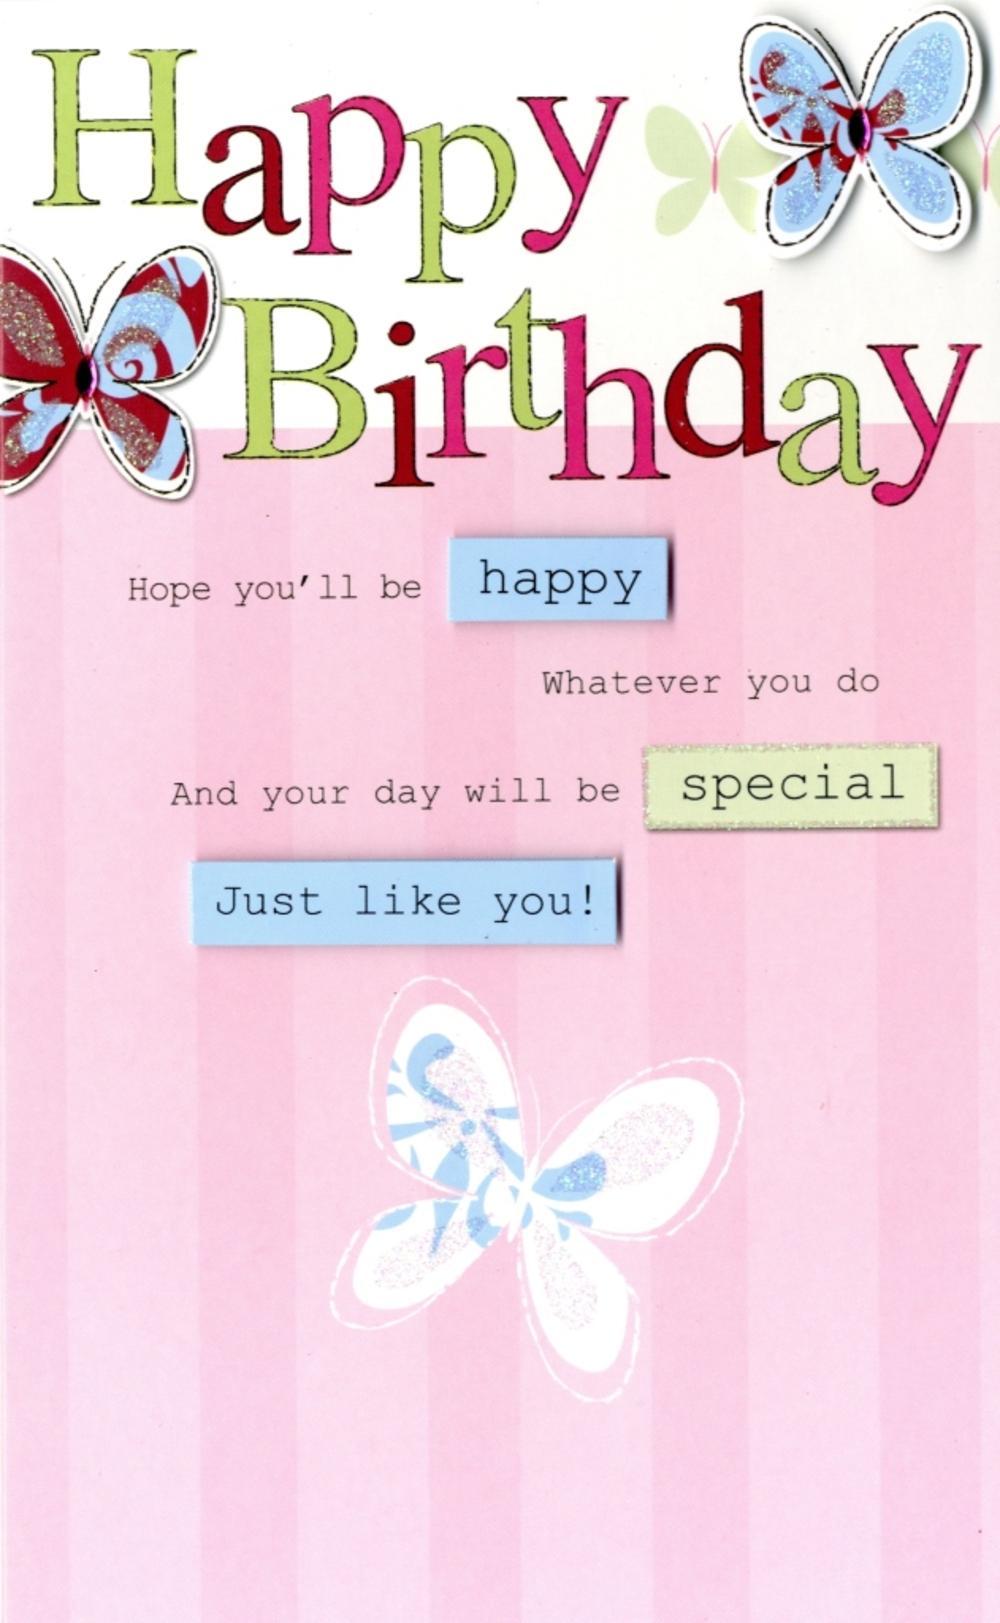 Breathtaking Happy Birthday Butterfly Greeting Card Happy Birthday Butterfly Greeting Card Cards Love Kates Happy Birthday Princess Happy Birthday Girl Spanish gifts Happy Birthday Pretty